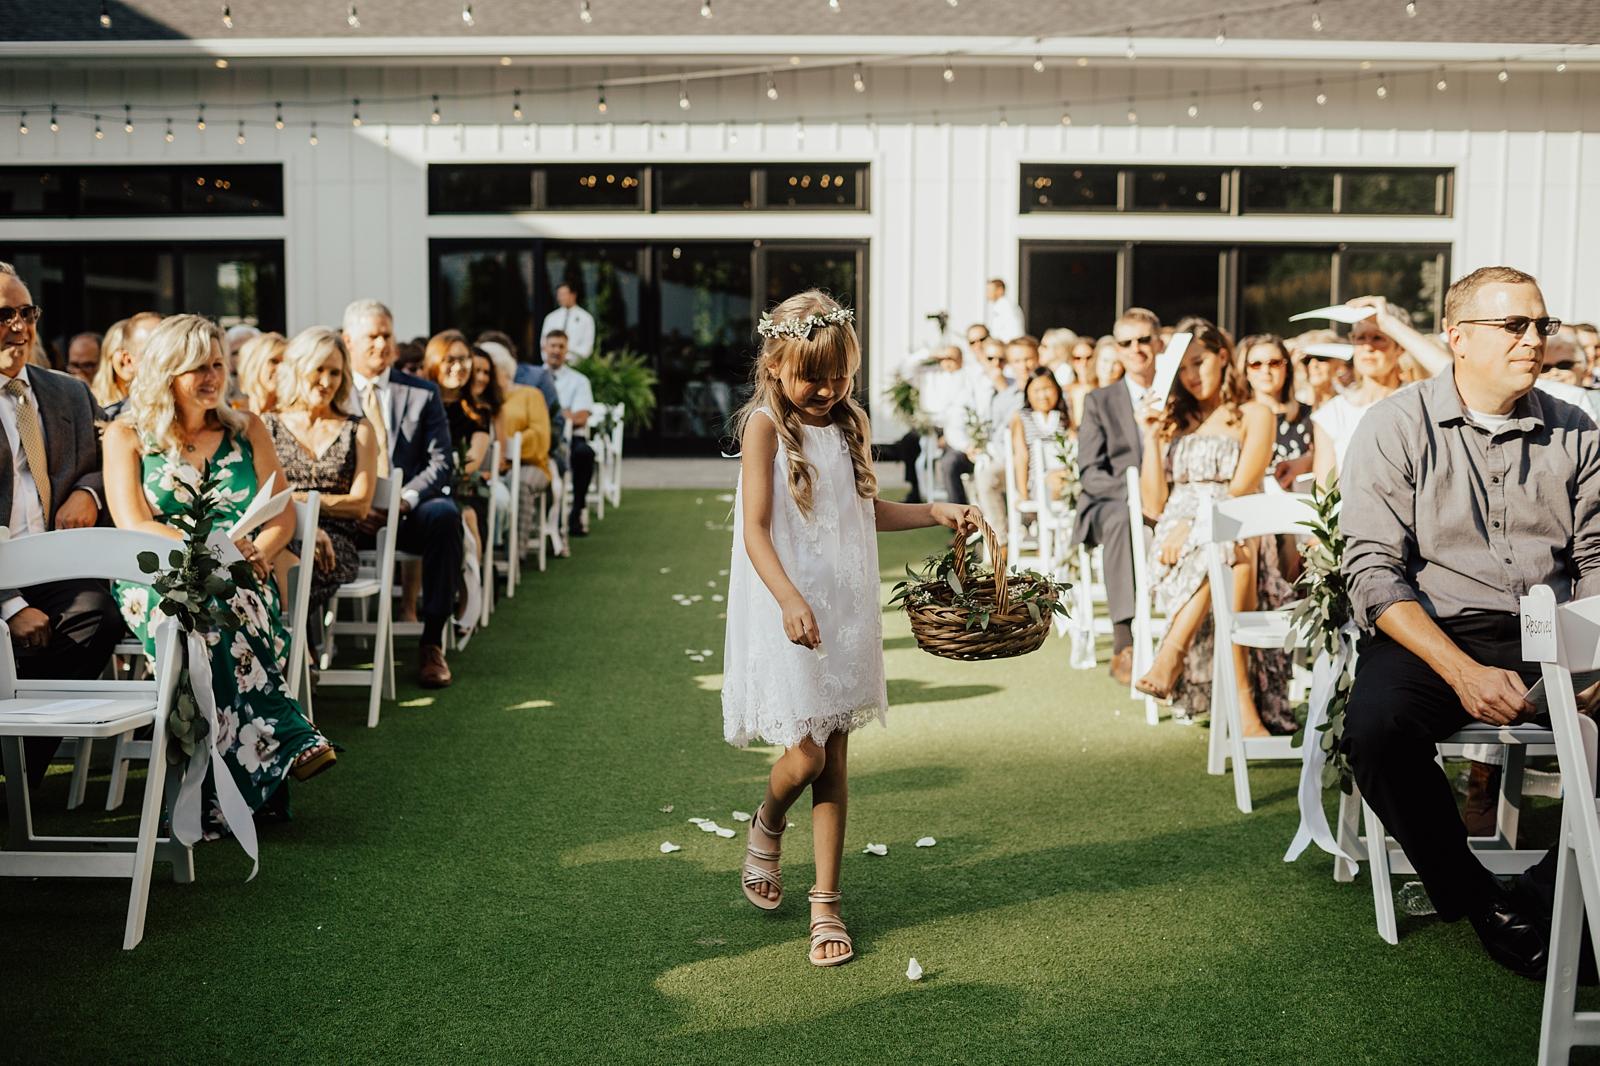 Anna & Trey Modern Minneapolis Wedding at The Hutton House_0714.jpg